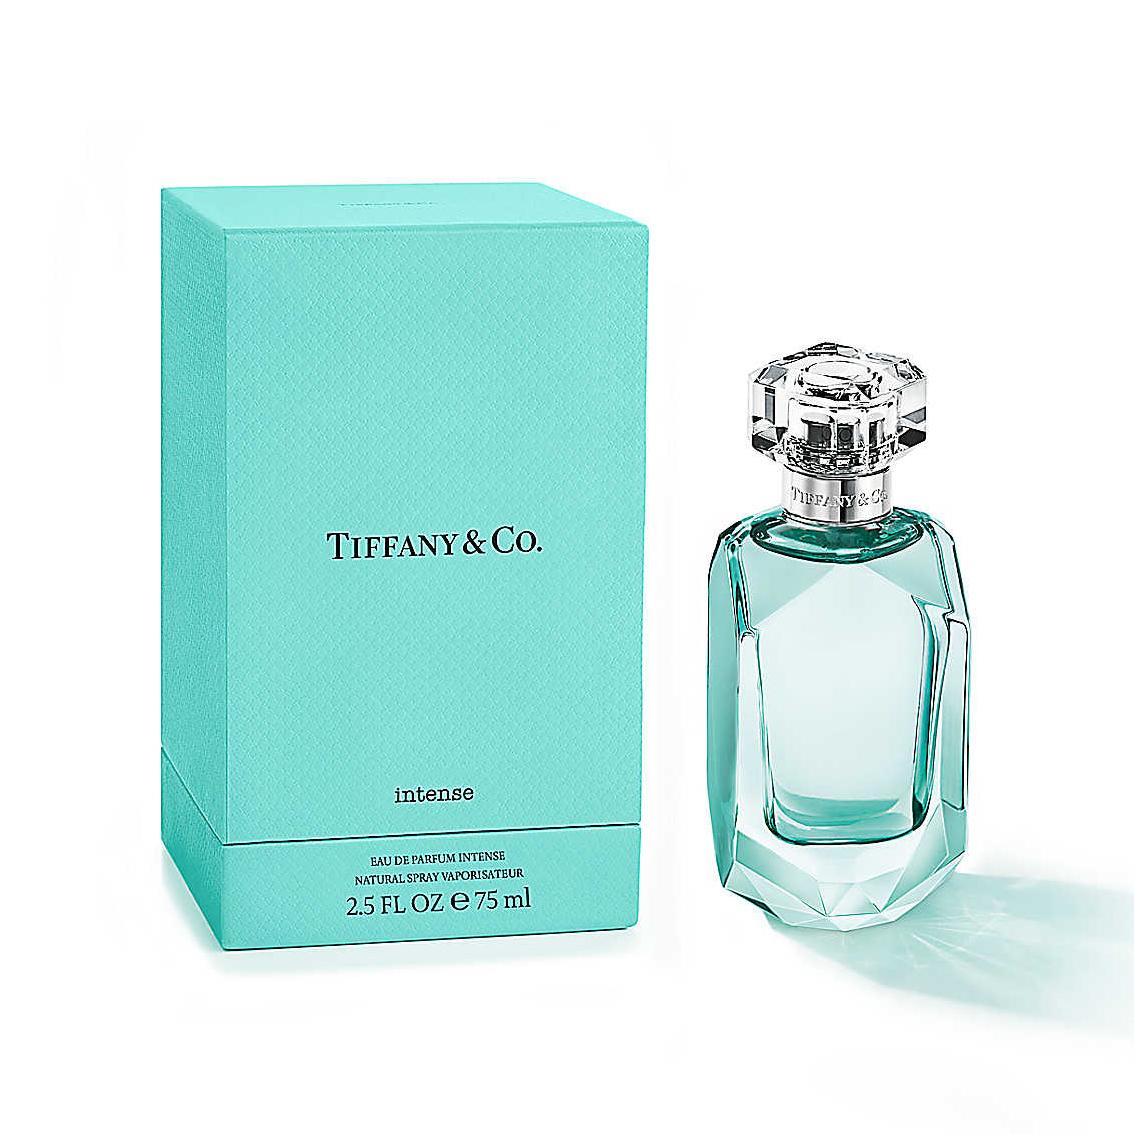 Tiffany & Co. eau de parfum intense 75 ml spray